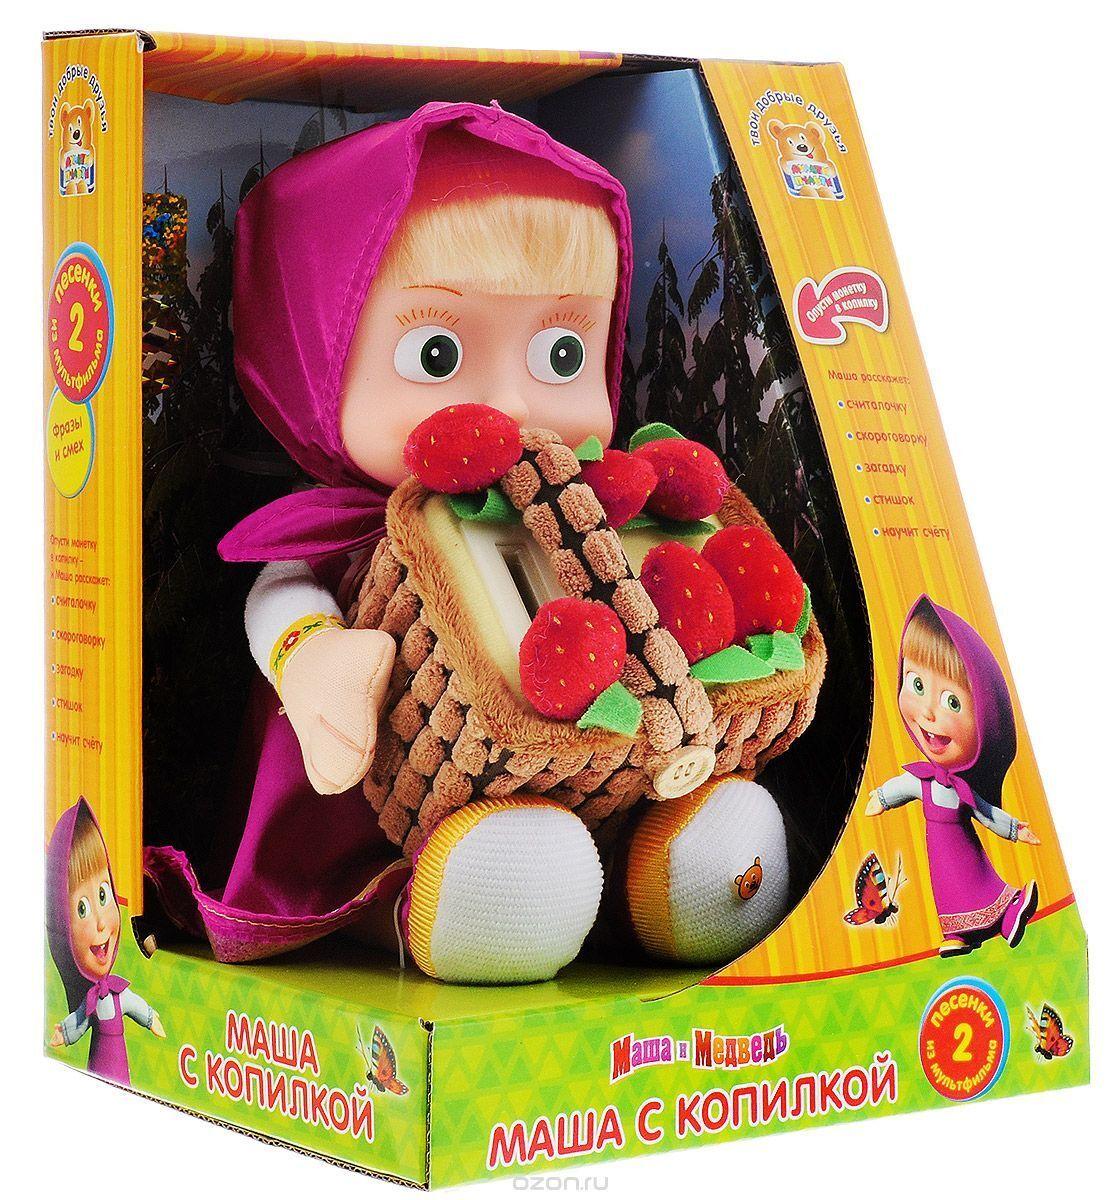 Russian talking plush toy Masha with moneybox  / Masha and the Bear -28cm